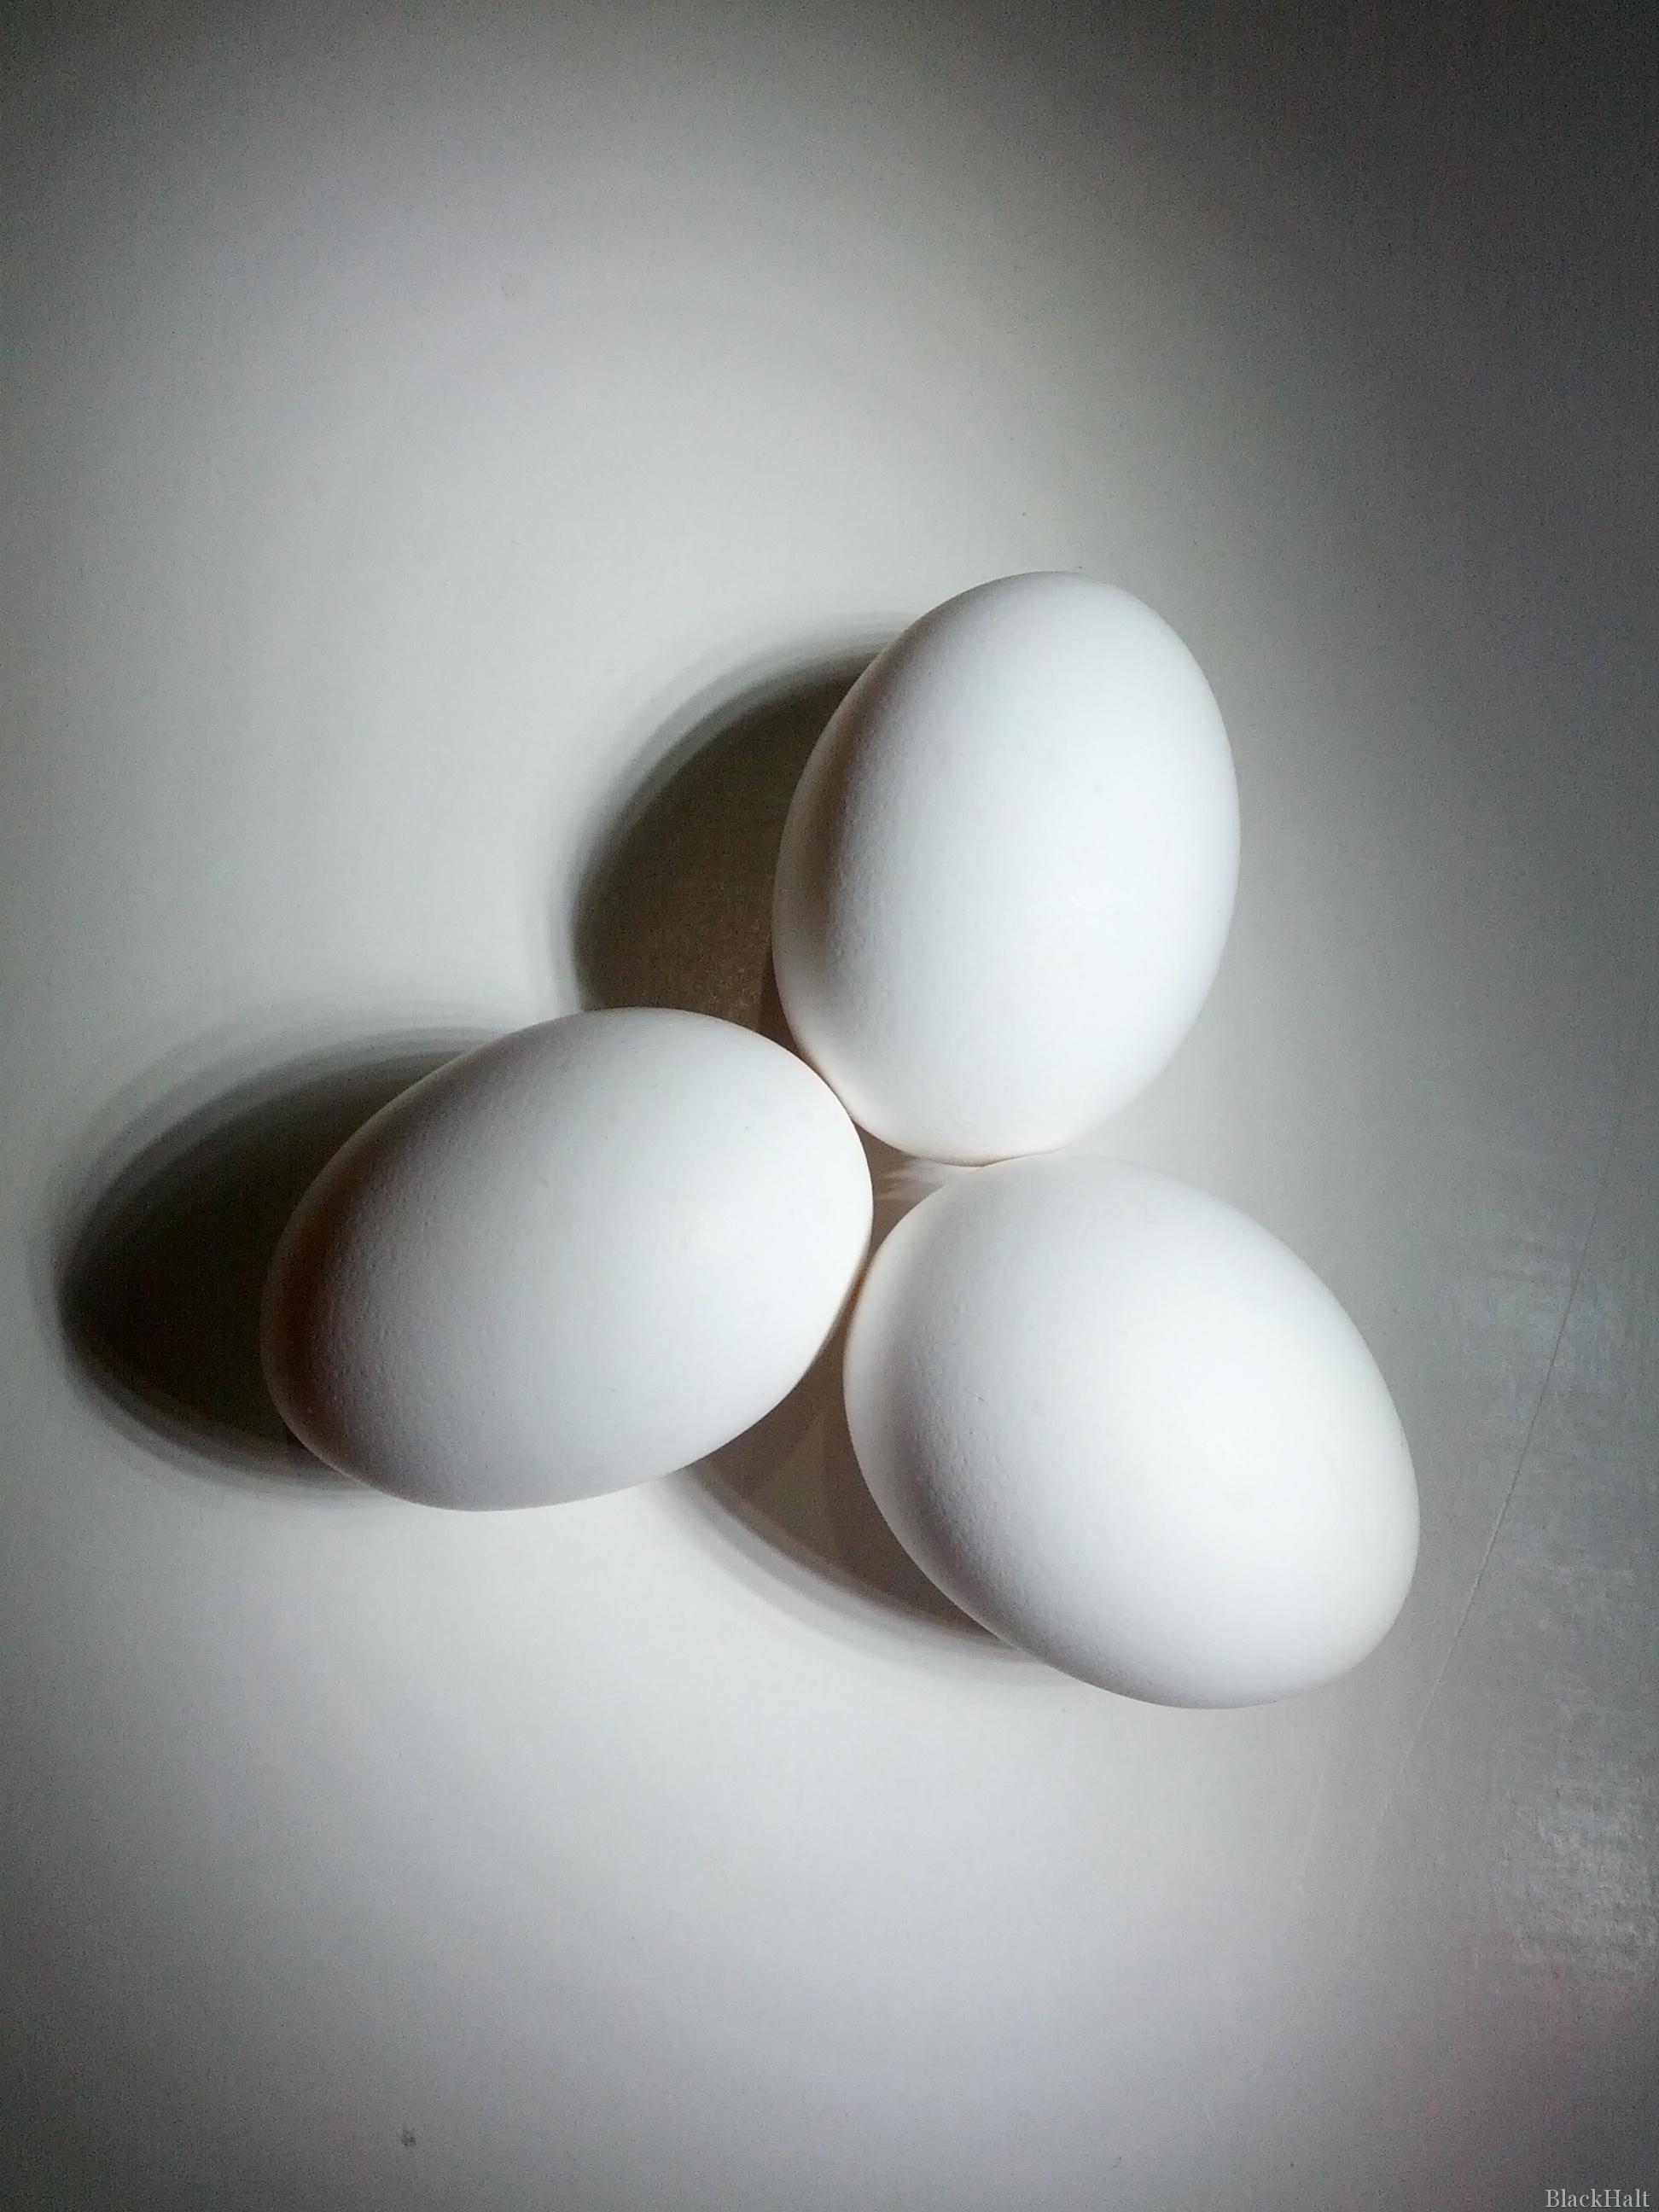 Lieldienu olas Nr.146